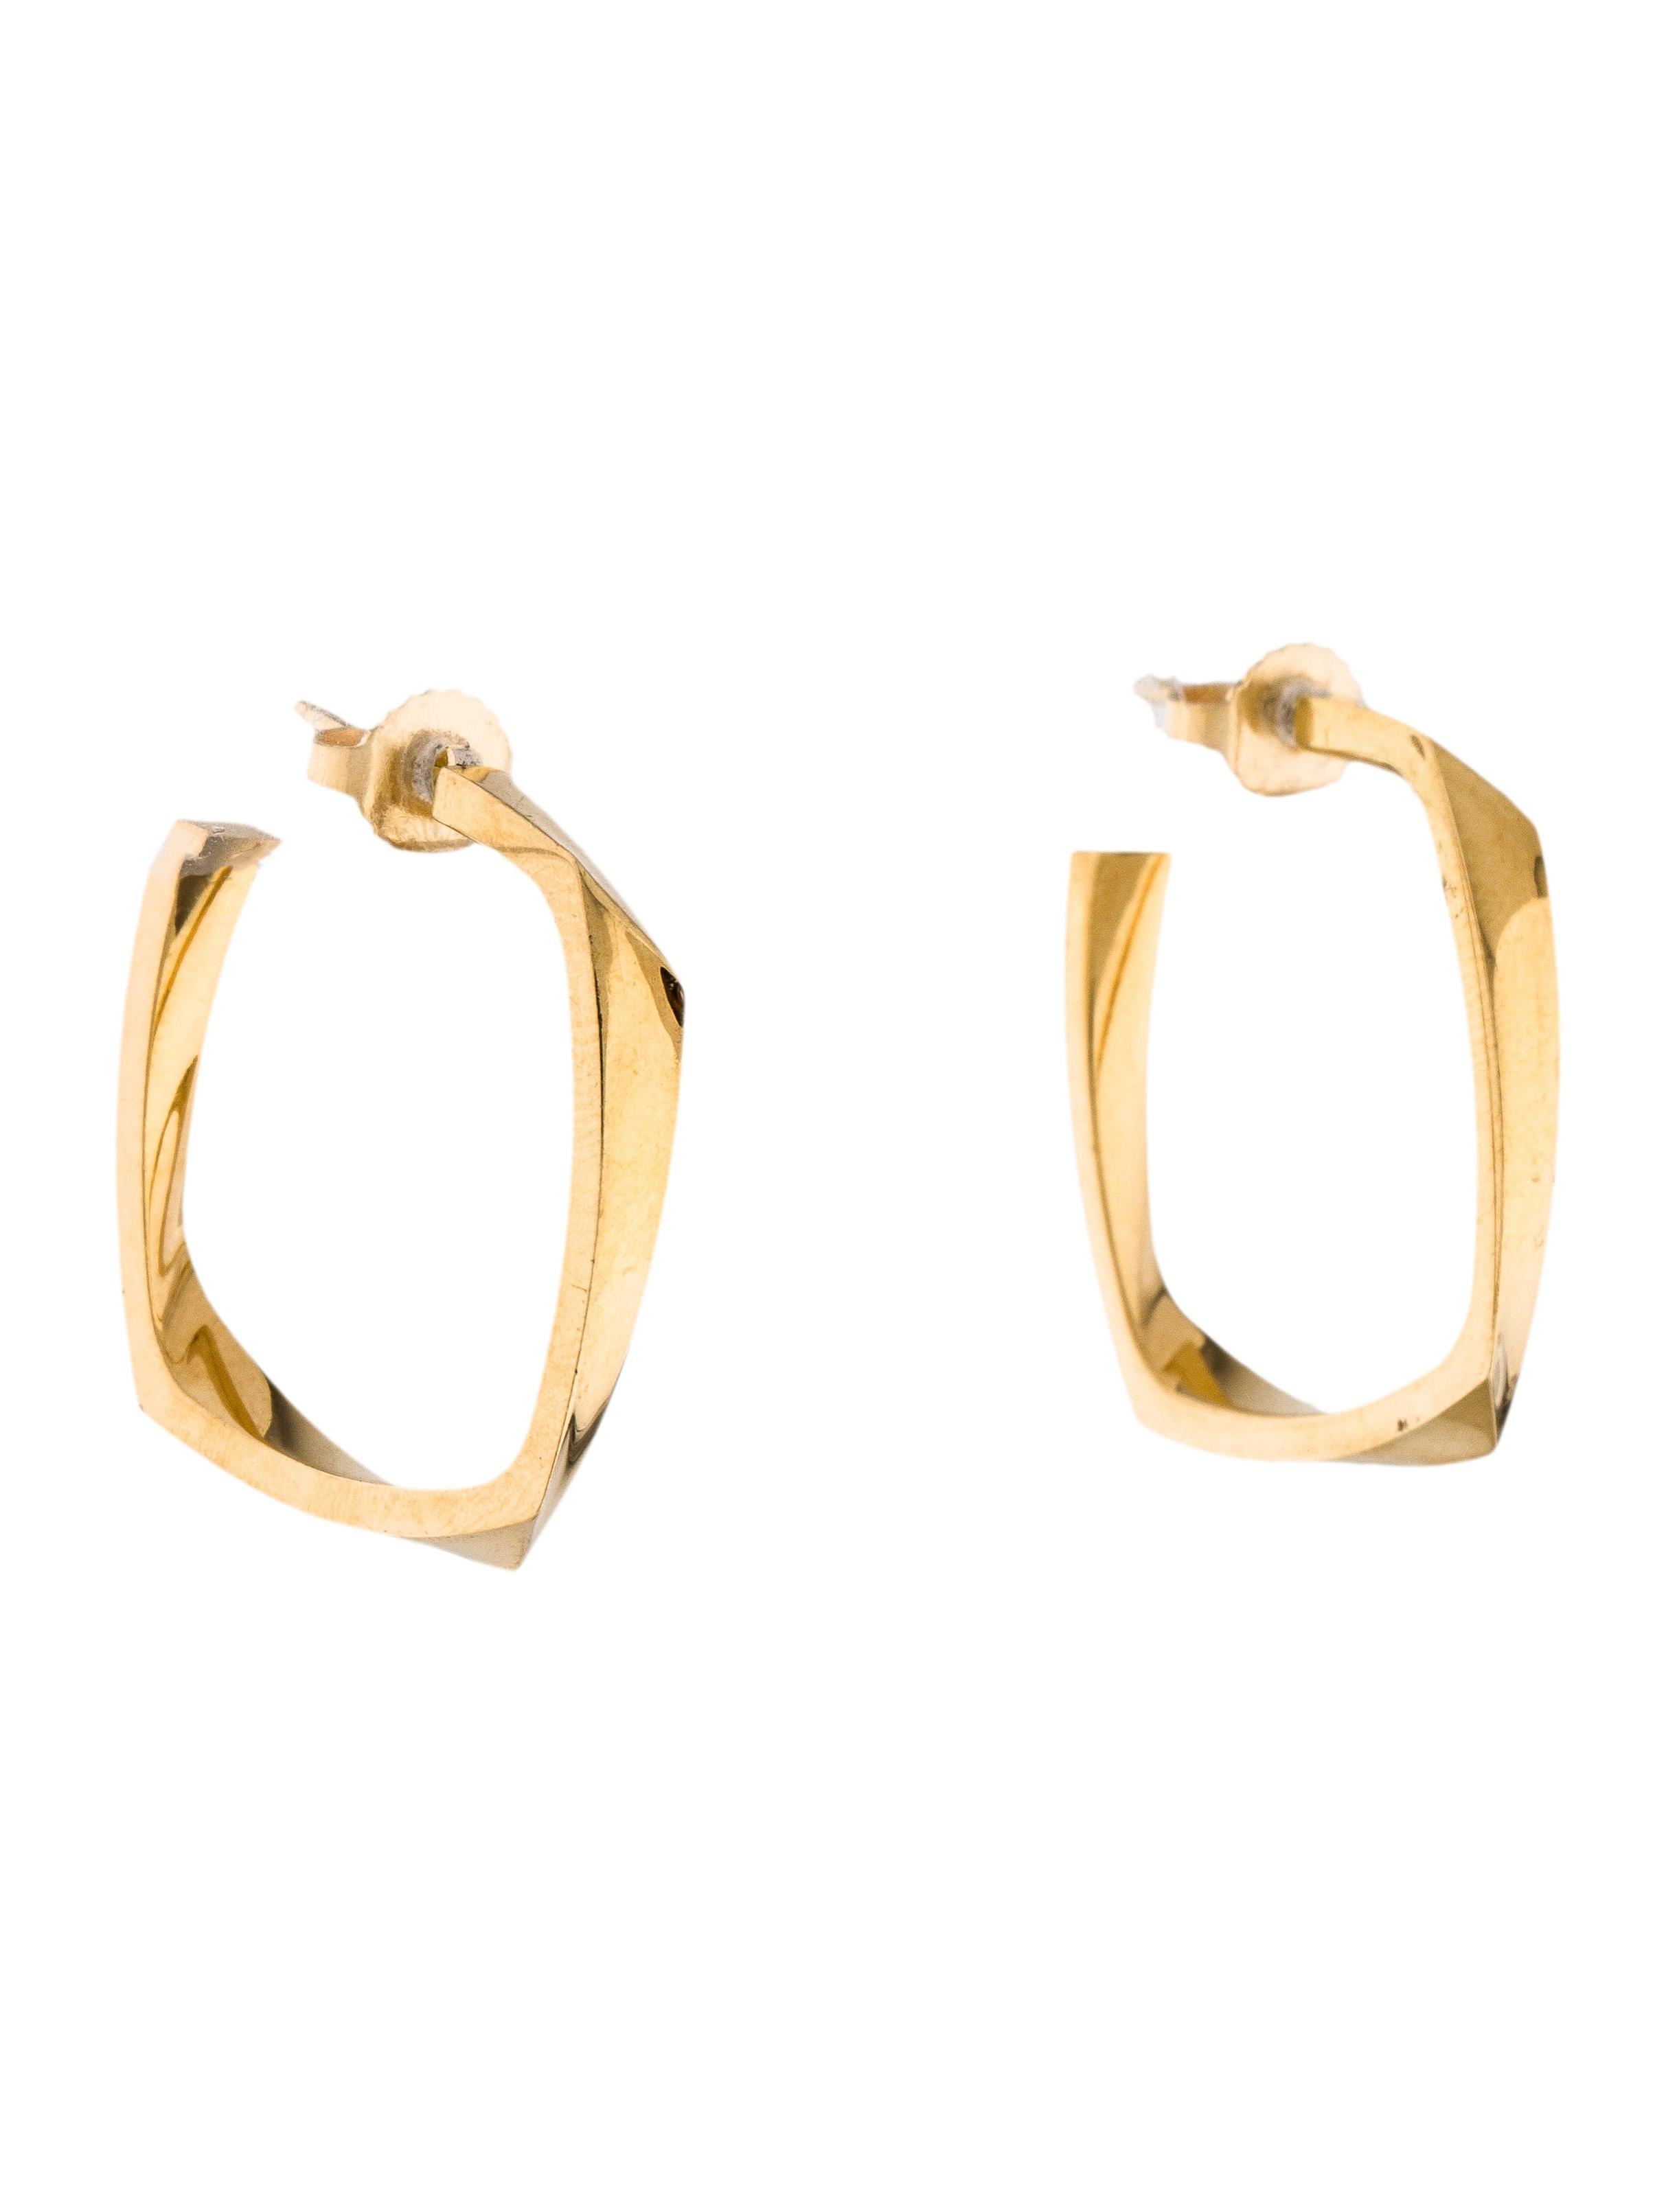 ff519ada6 Tiffany & Co. 18K Torque Hoop Earrings - Earrings - TIF60038 | The RealReal